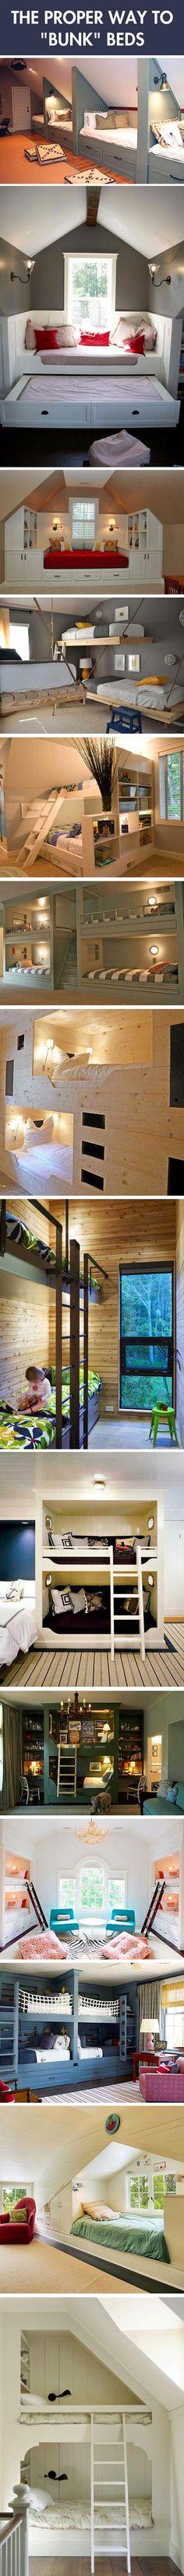 The coolest bunk beds.